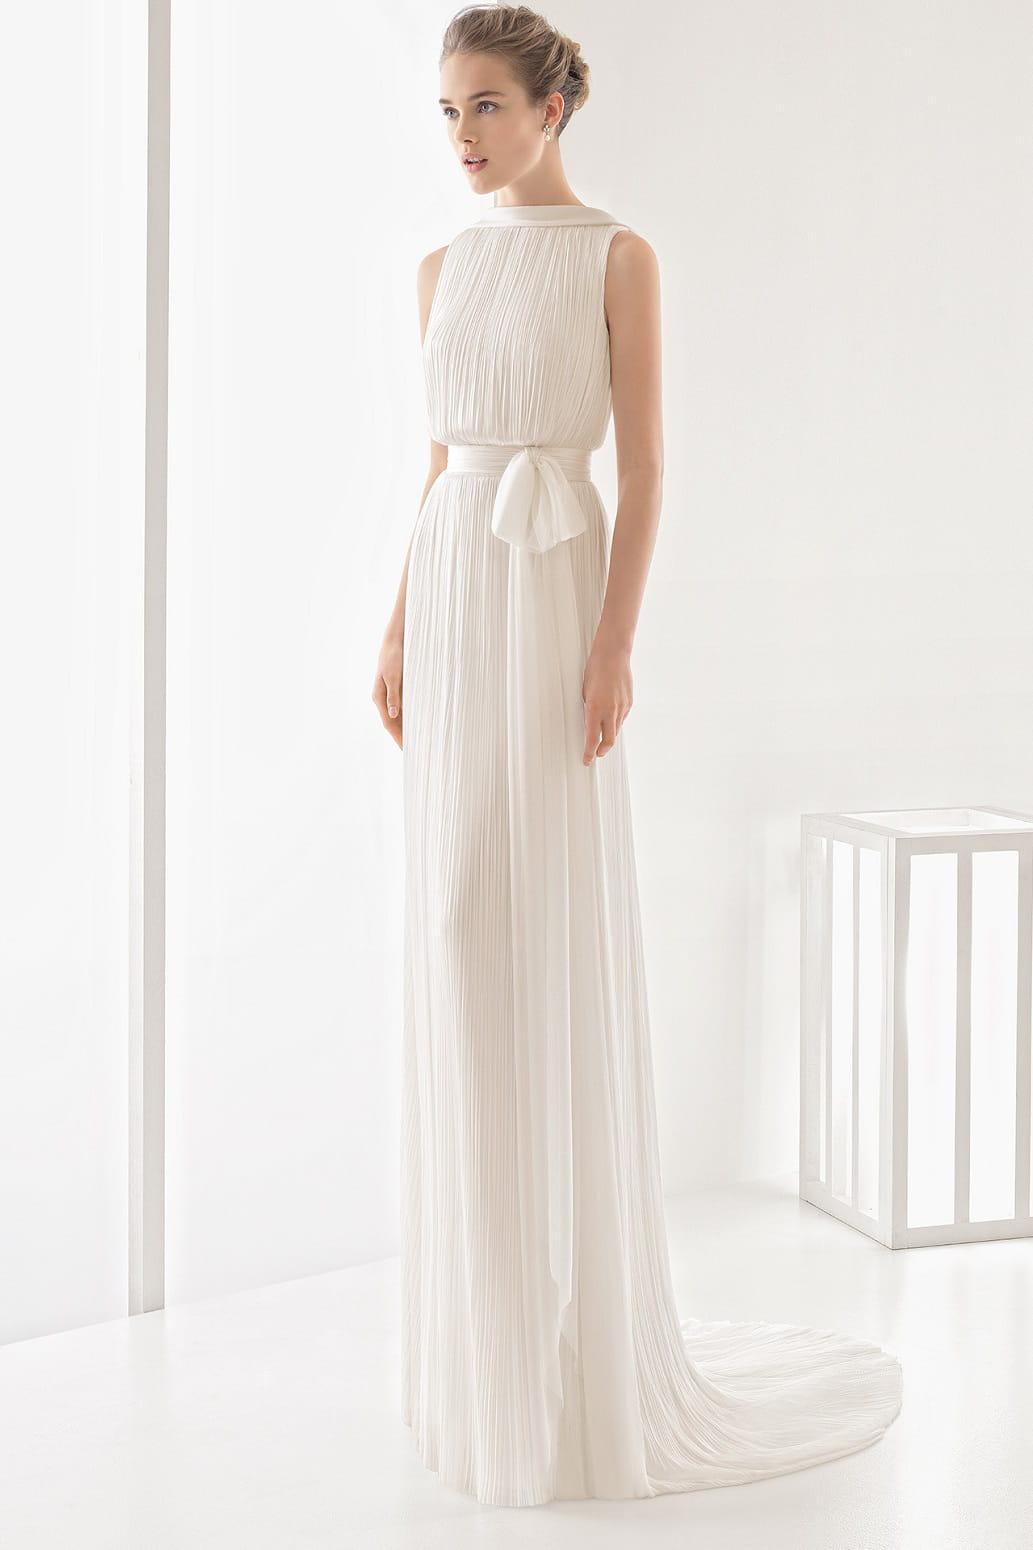 robe vintage pour mariage maison design. Black Bedroom Furniture Sets. Home Design Ideas